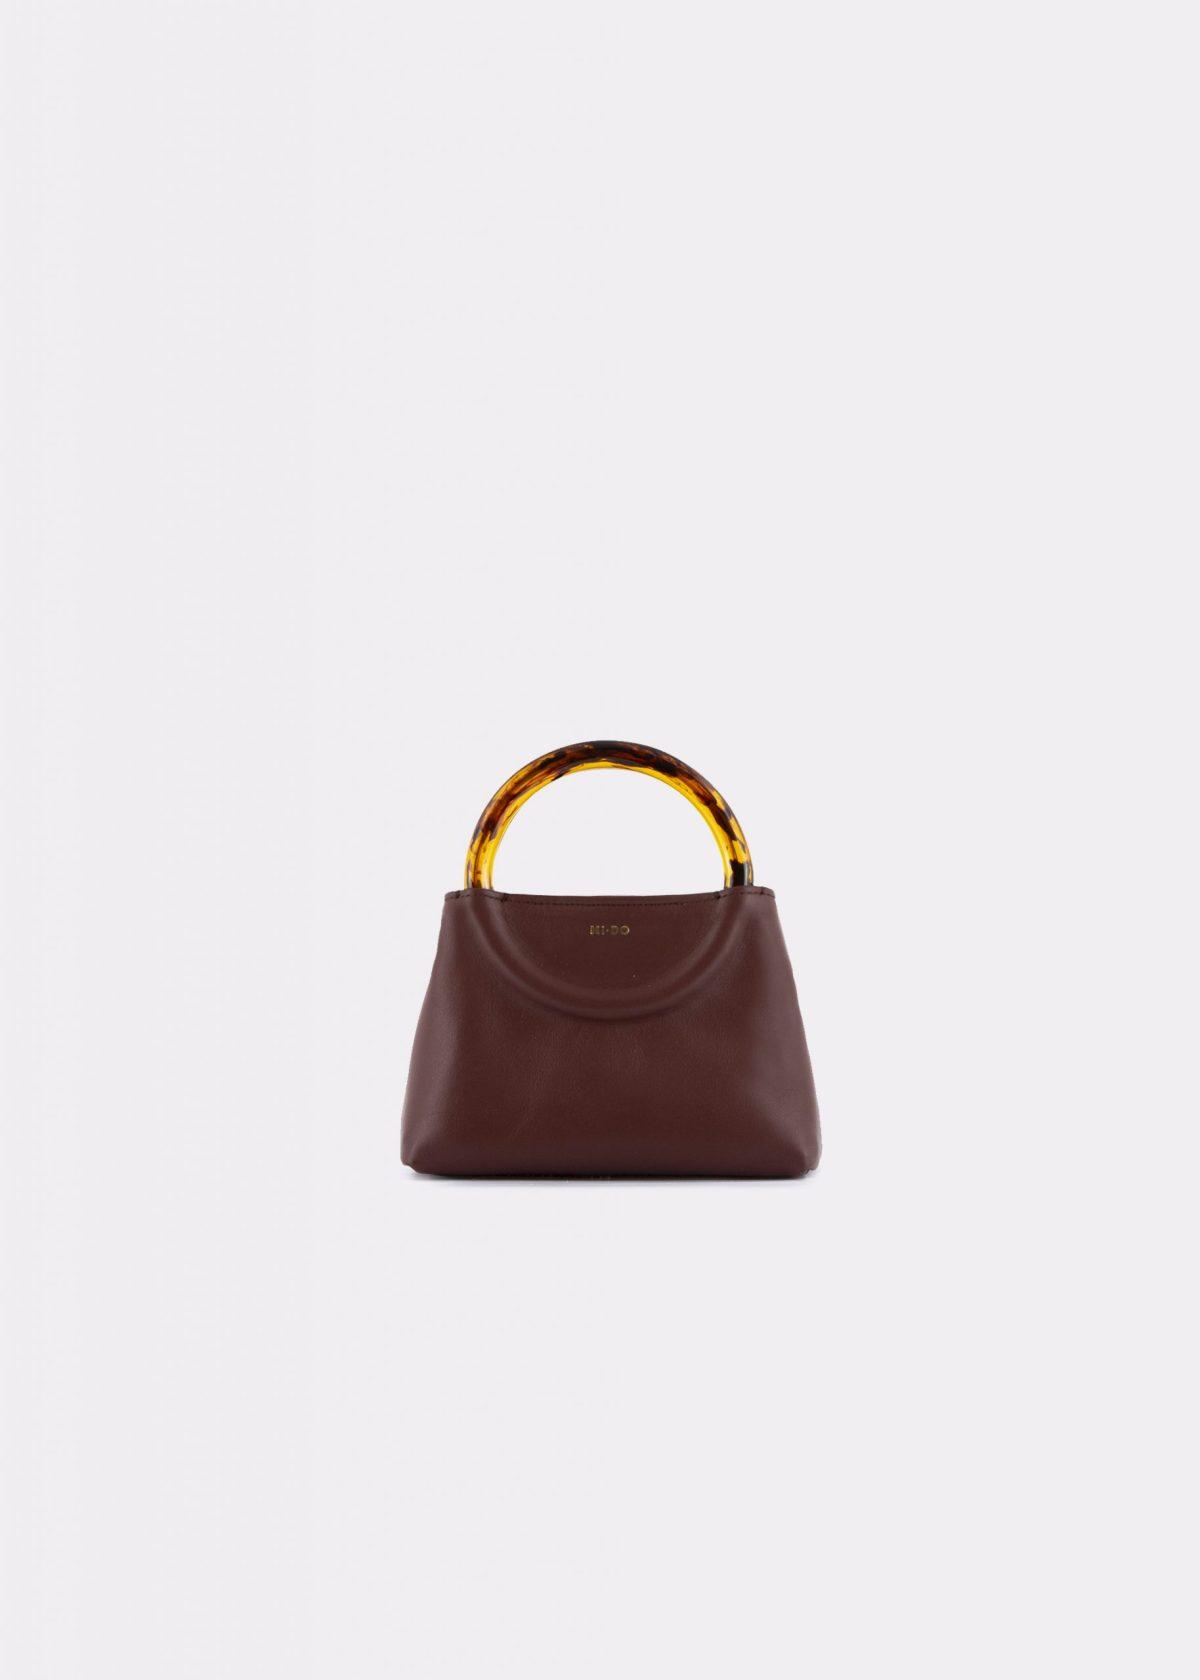 NIDO Bolla_Micro bag chestnut_front view